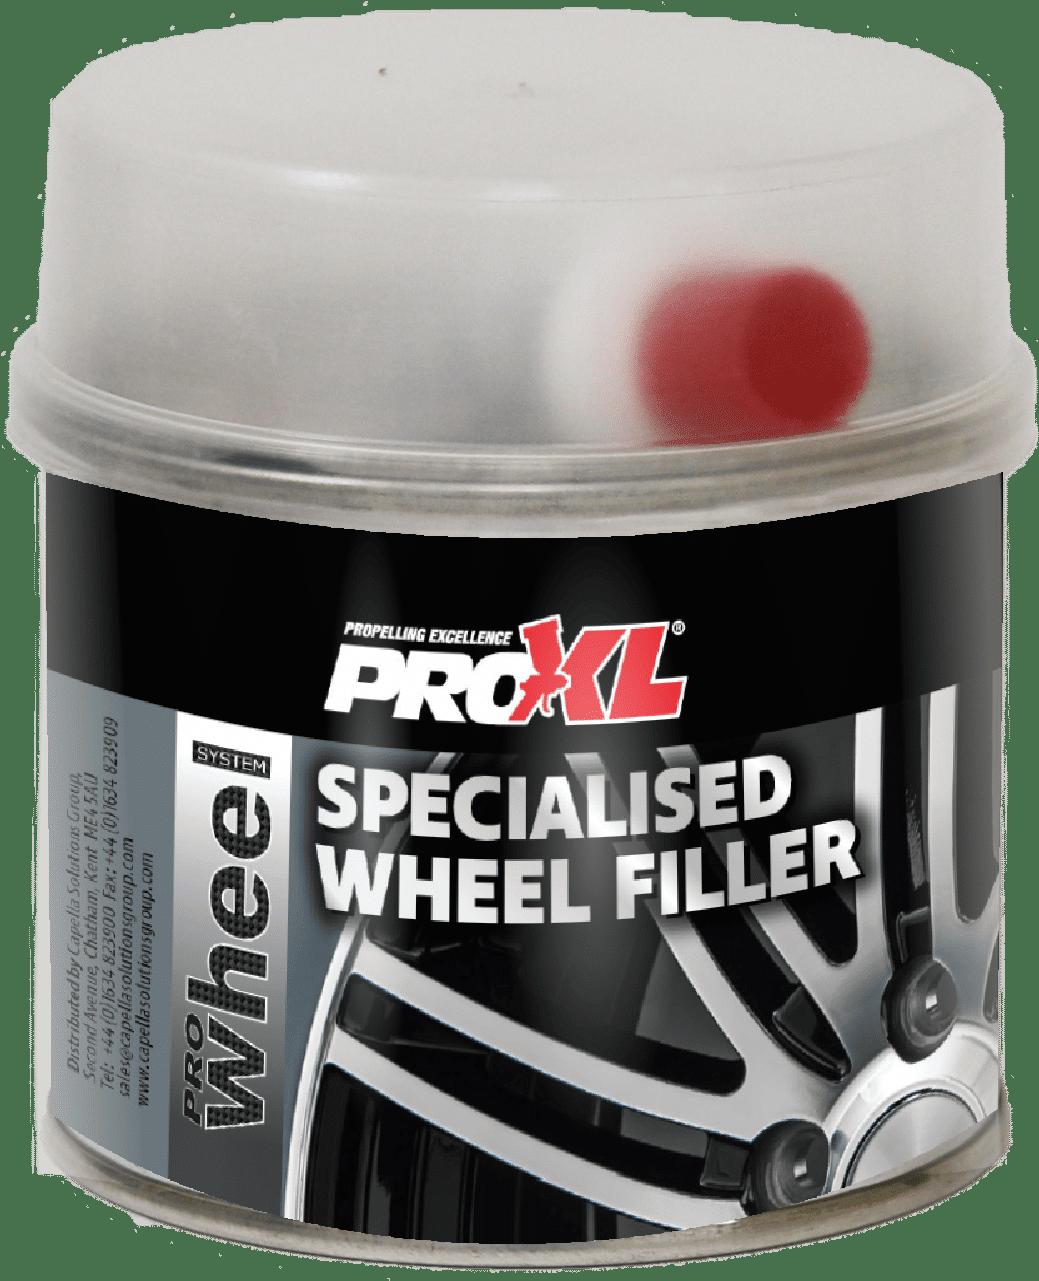 ProWheel Specialised Wheel Filler (250ml) Product Image